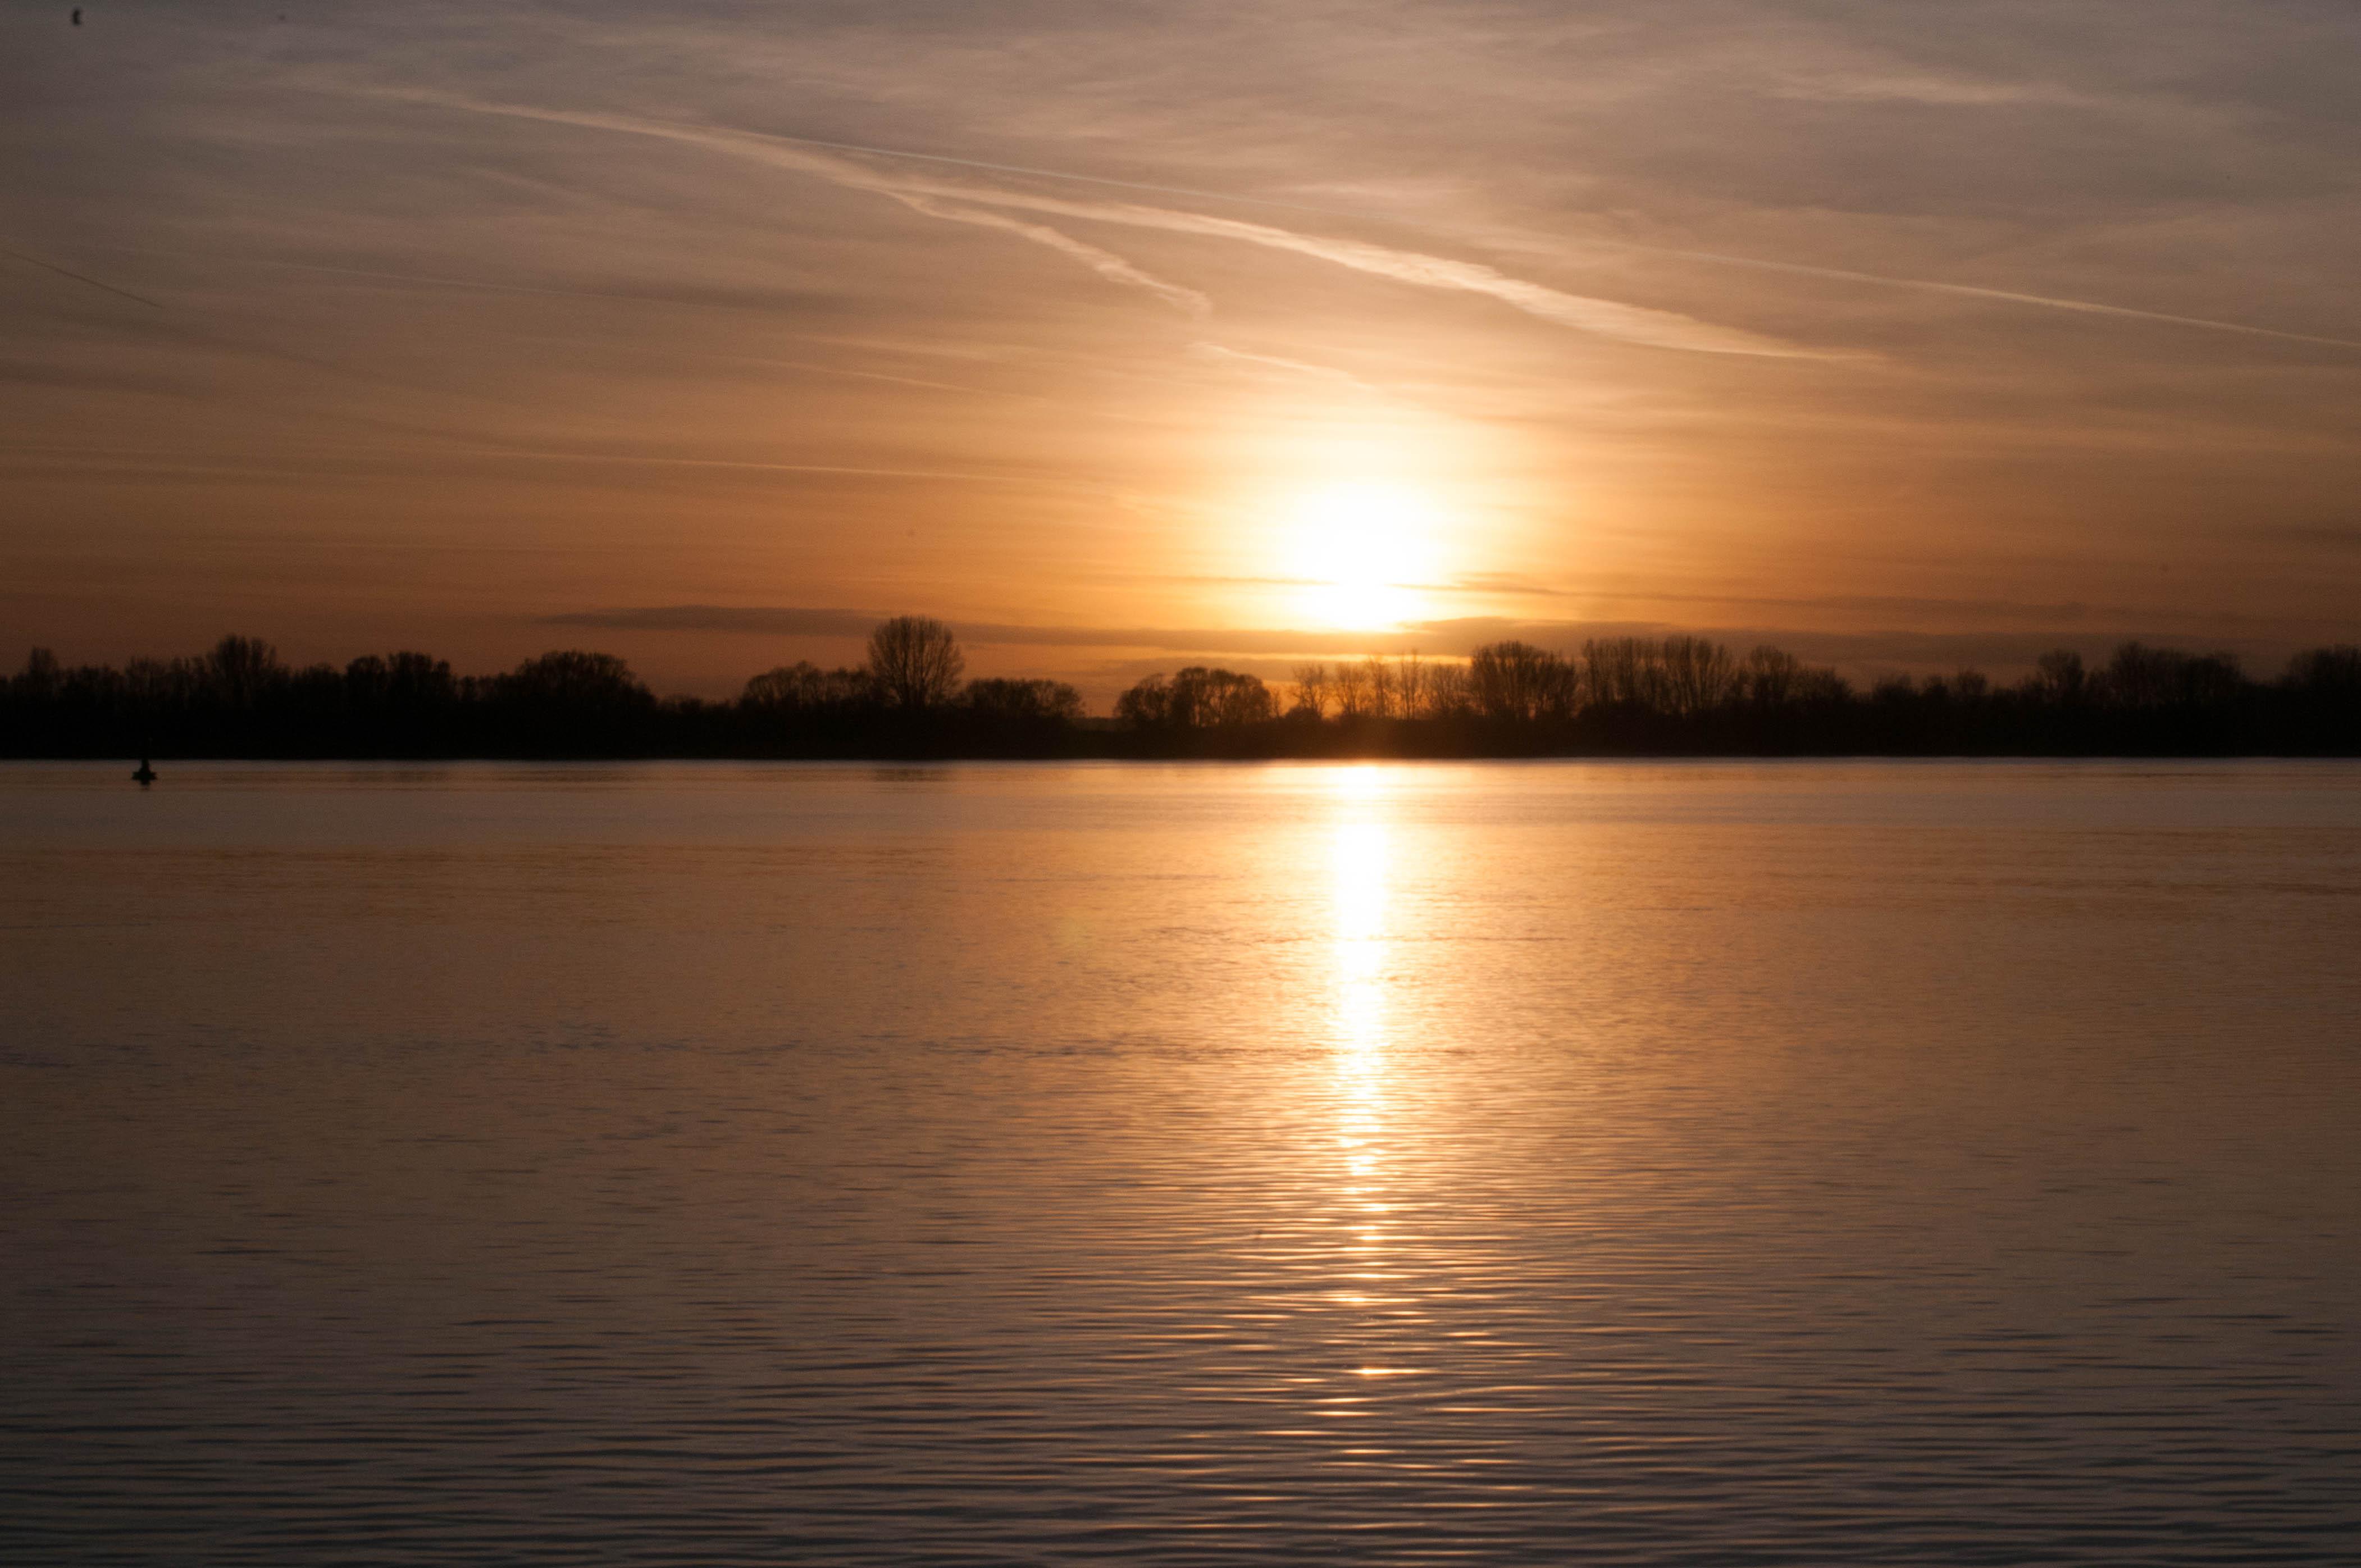 Sonnenuntergang bei Wittenbergen